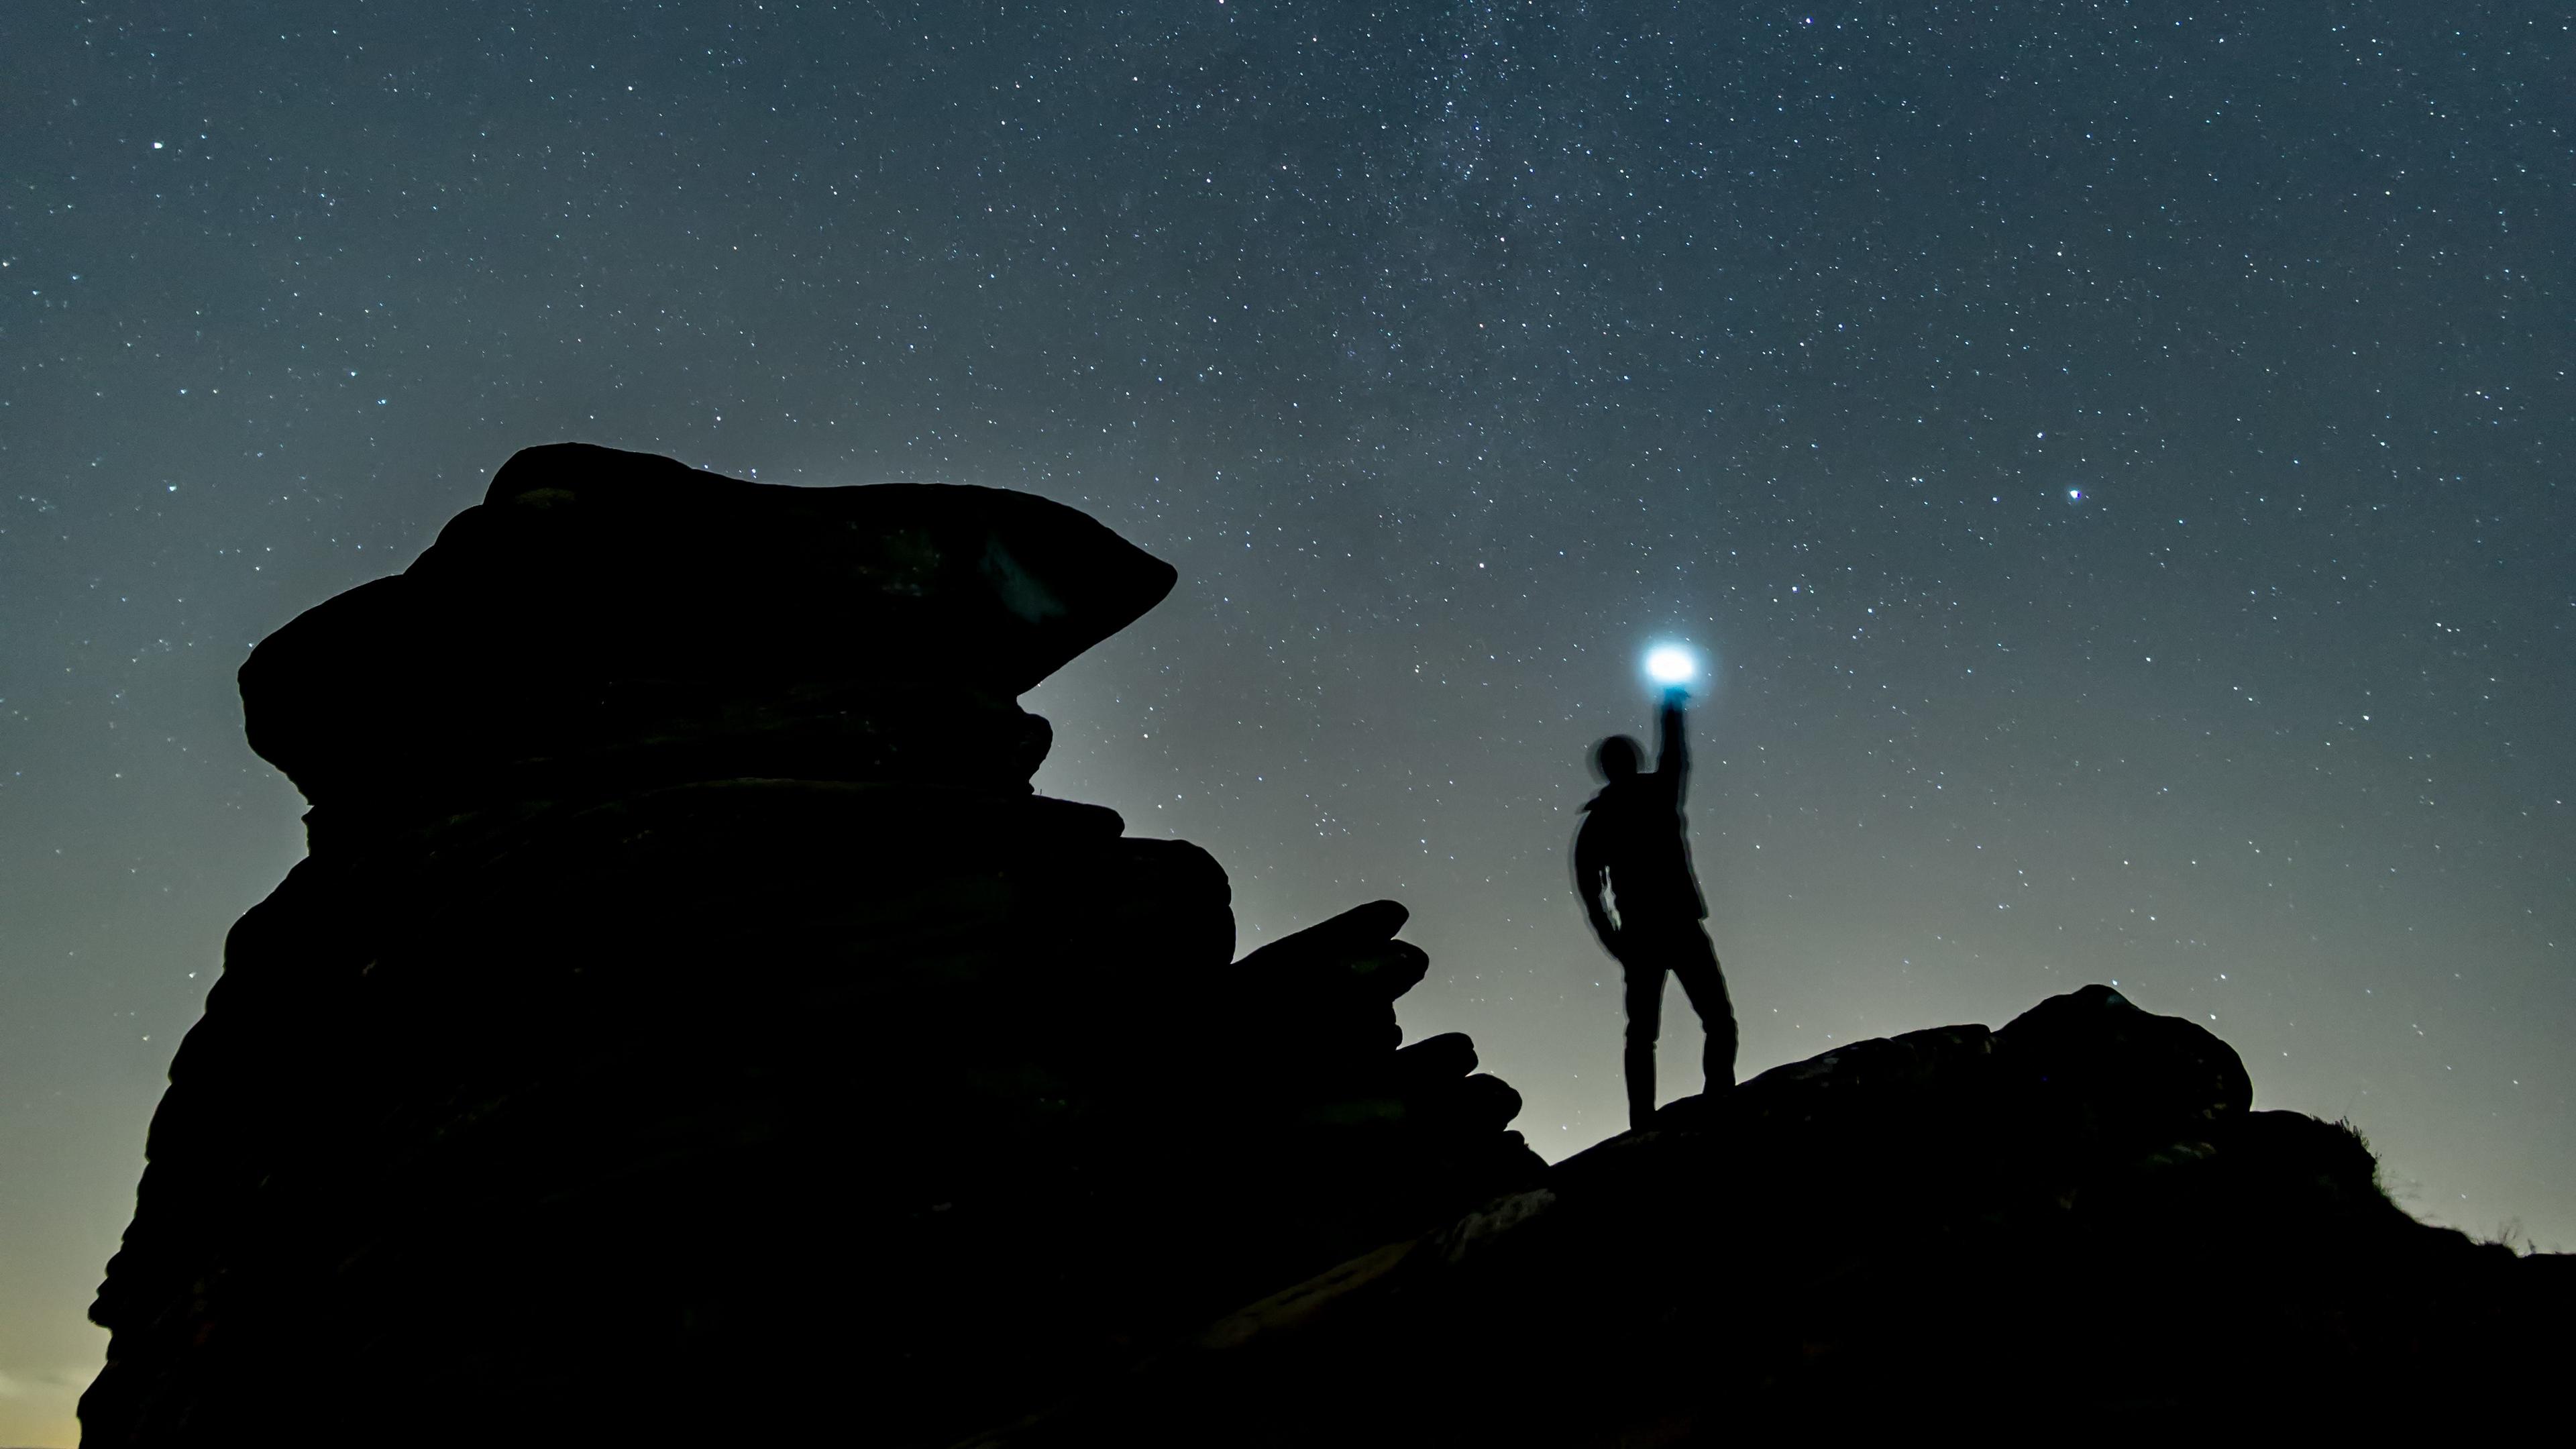 starry sky silhouette spectral rocks 4k 1540574887 - starry sky, silhouette, spectral, rocks 4k - starry sky, spectral, Silhouette